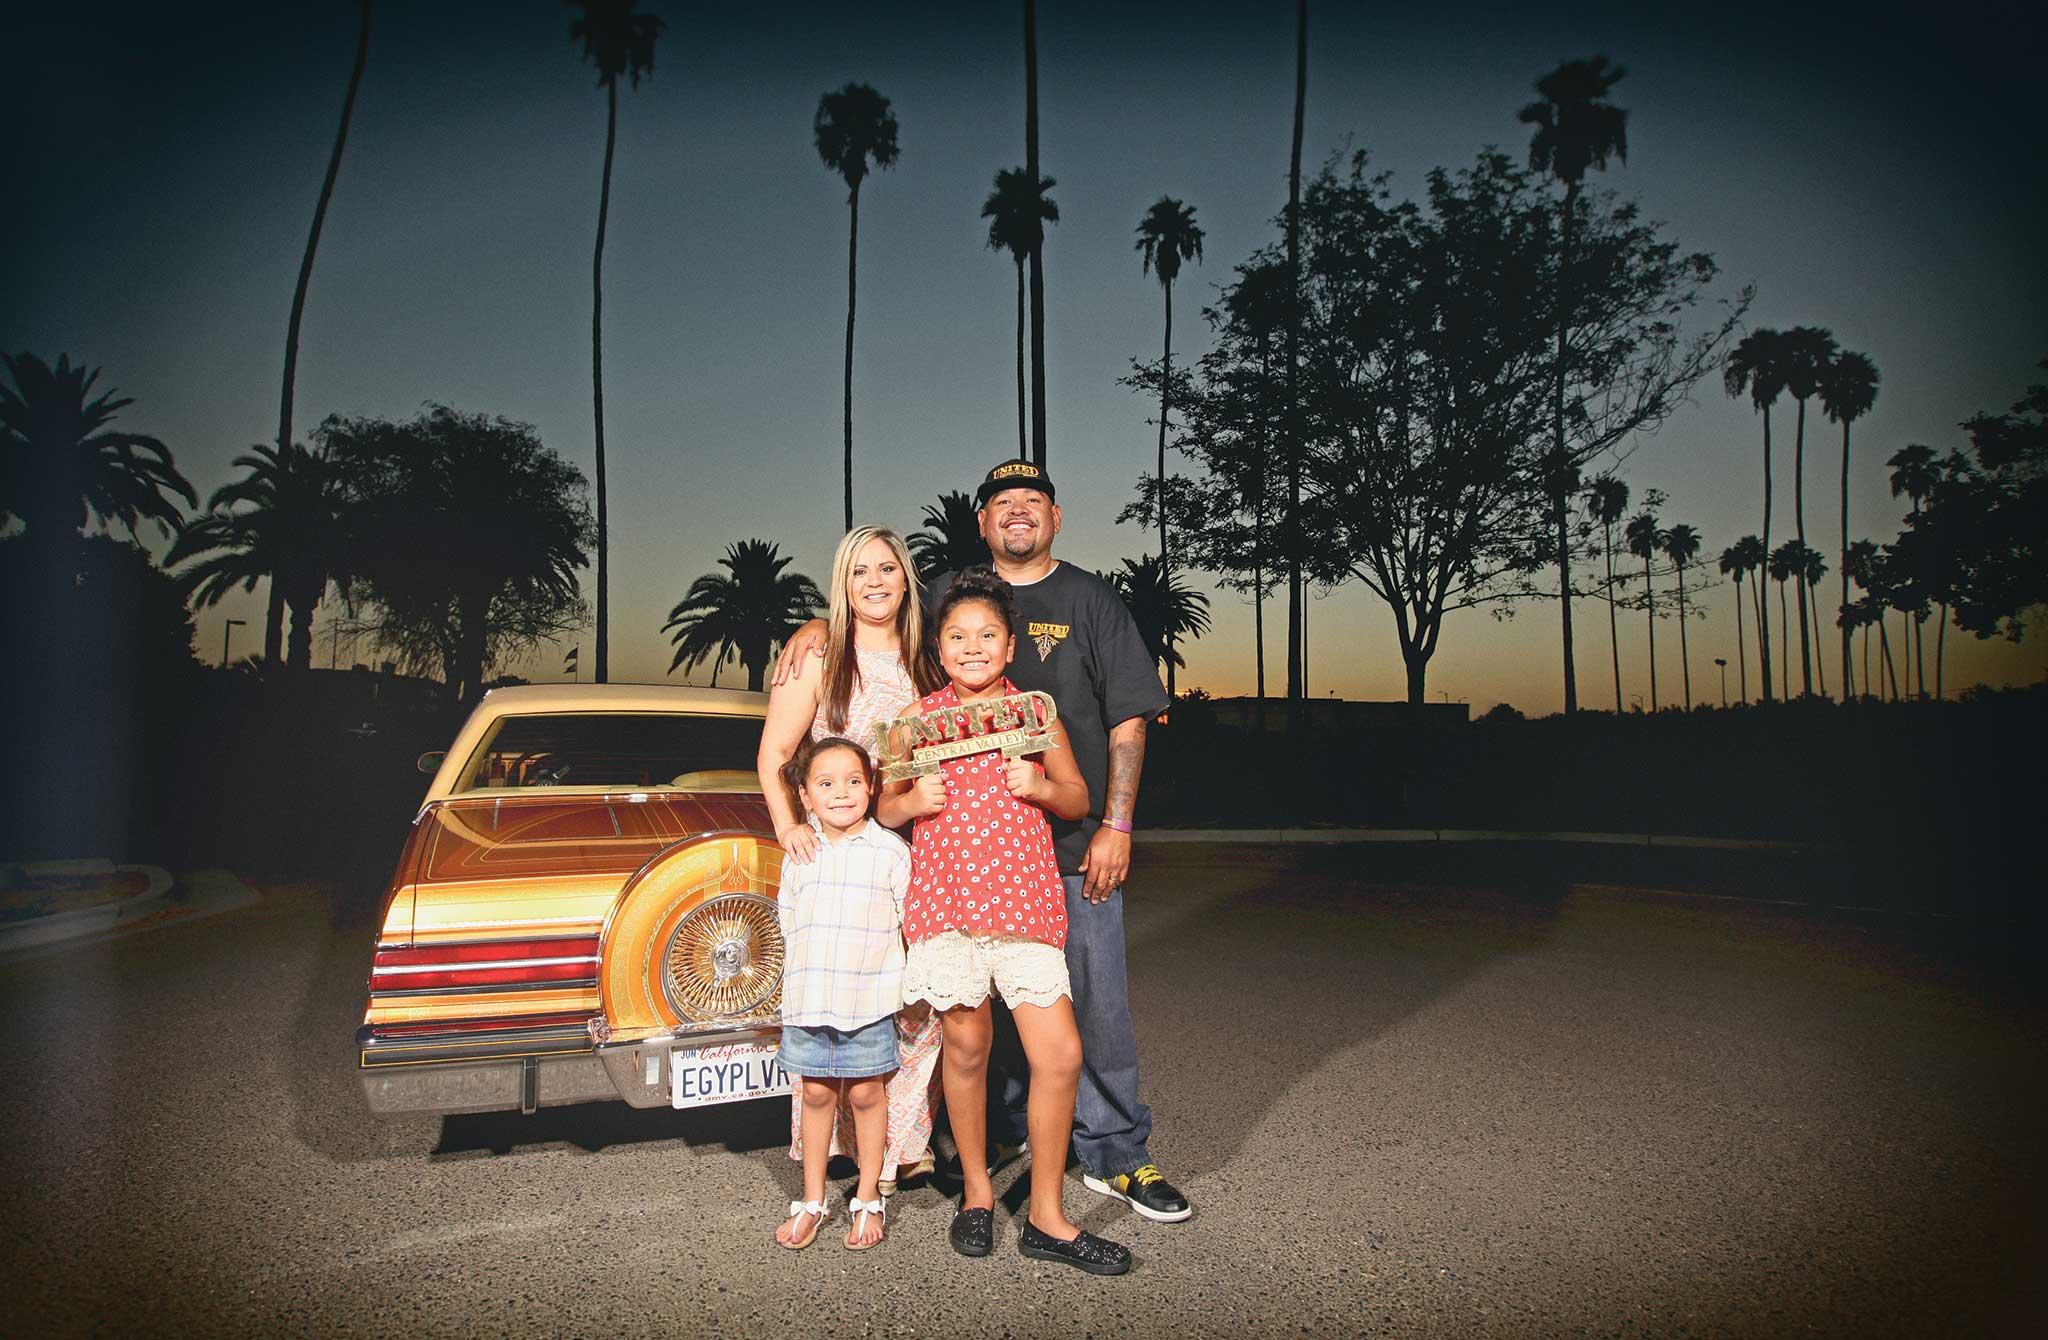 1986 buick regal villegas family 003